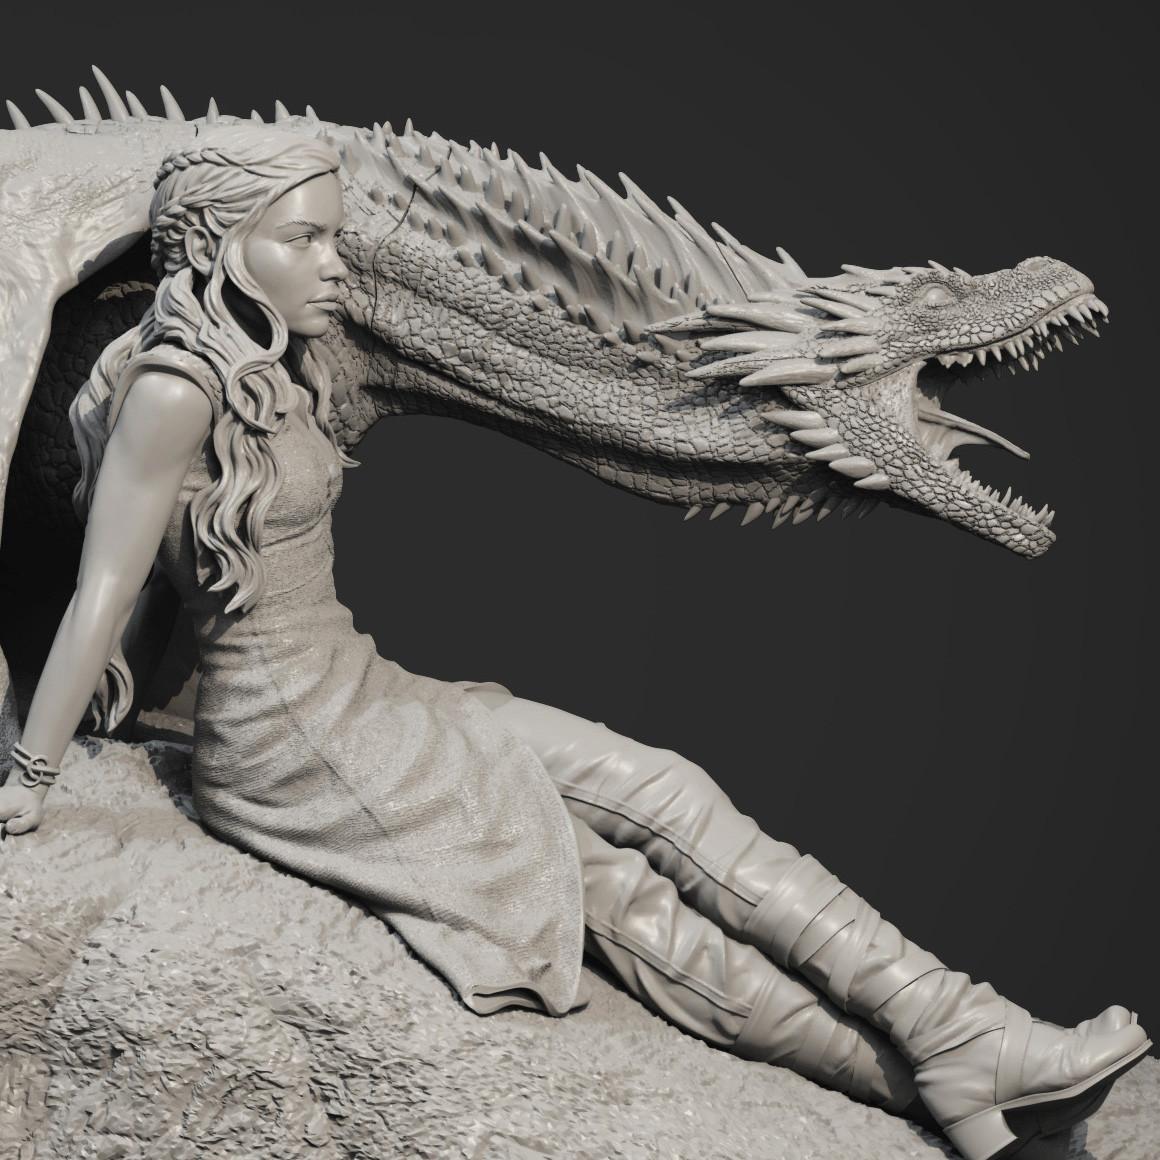 Artstation - Daenerys Targaryen Drogon Game Of Thrones Statue Edward Mosqueda